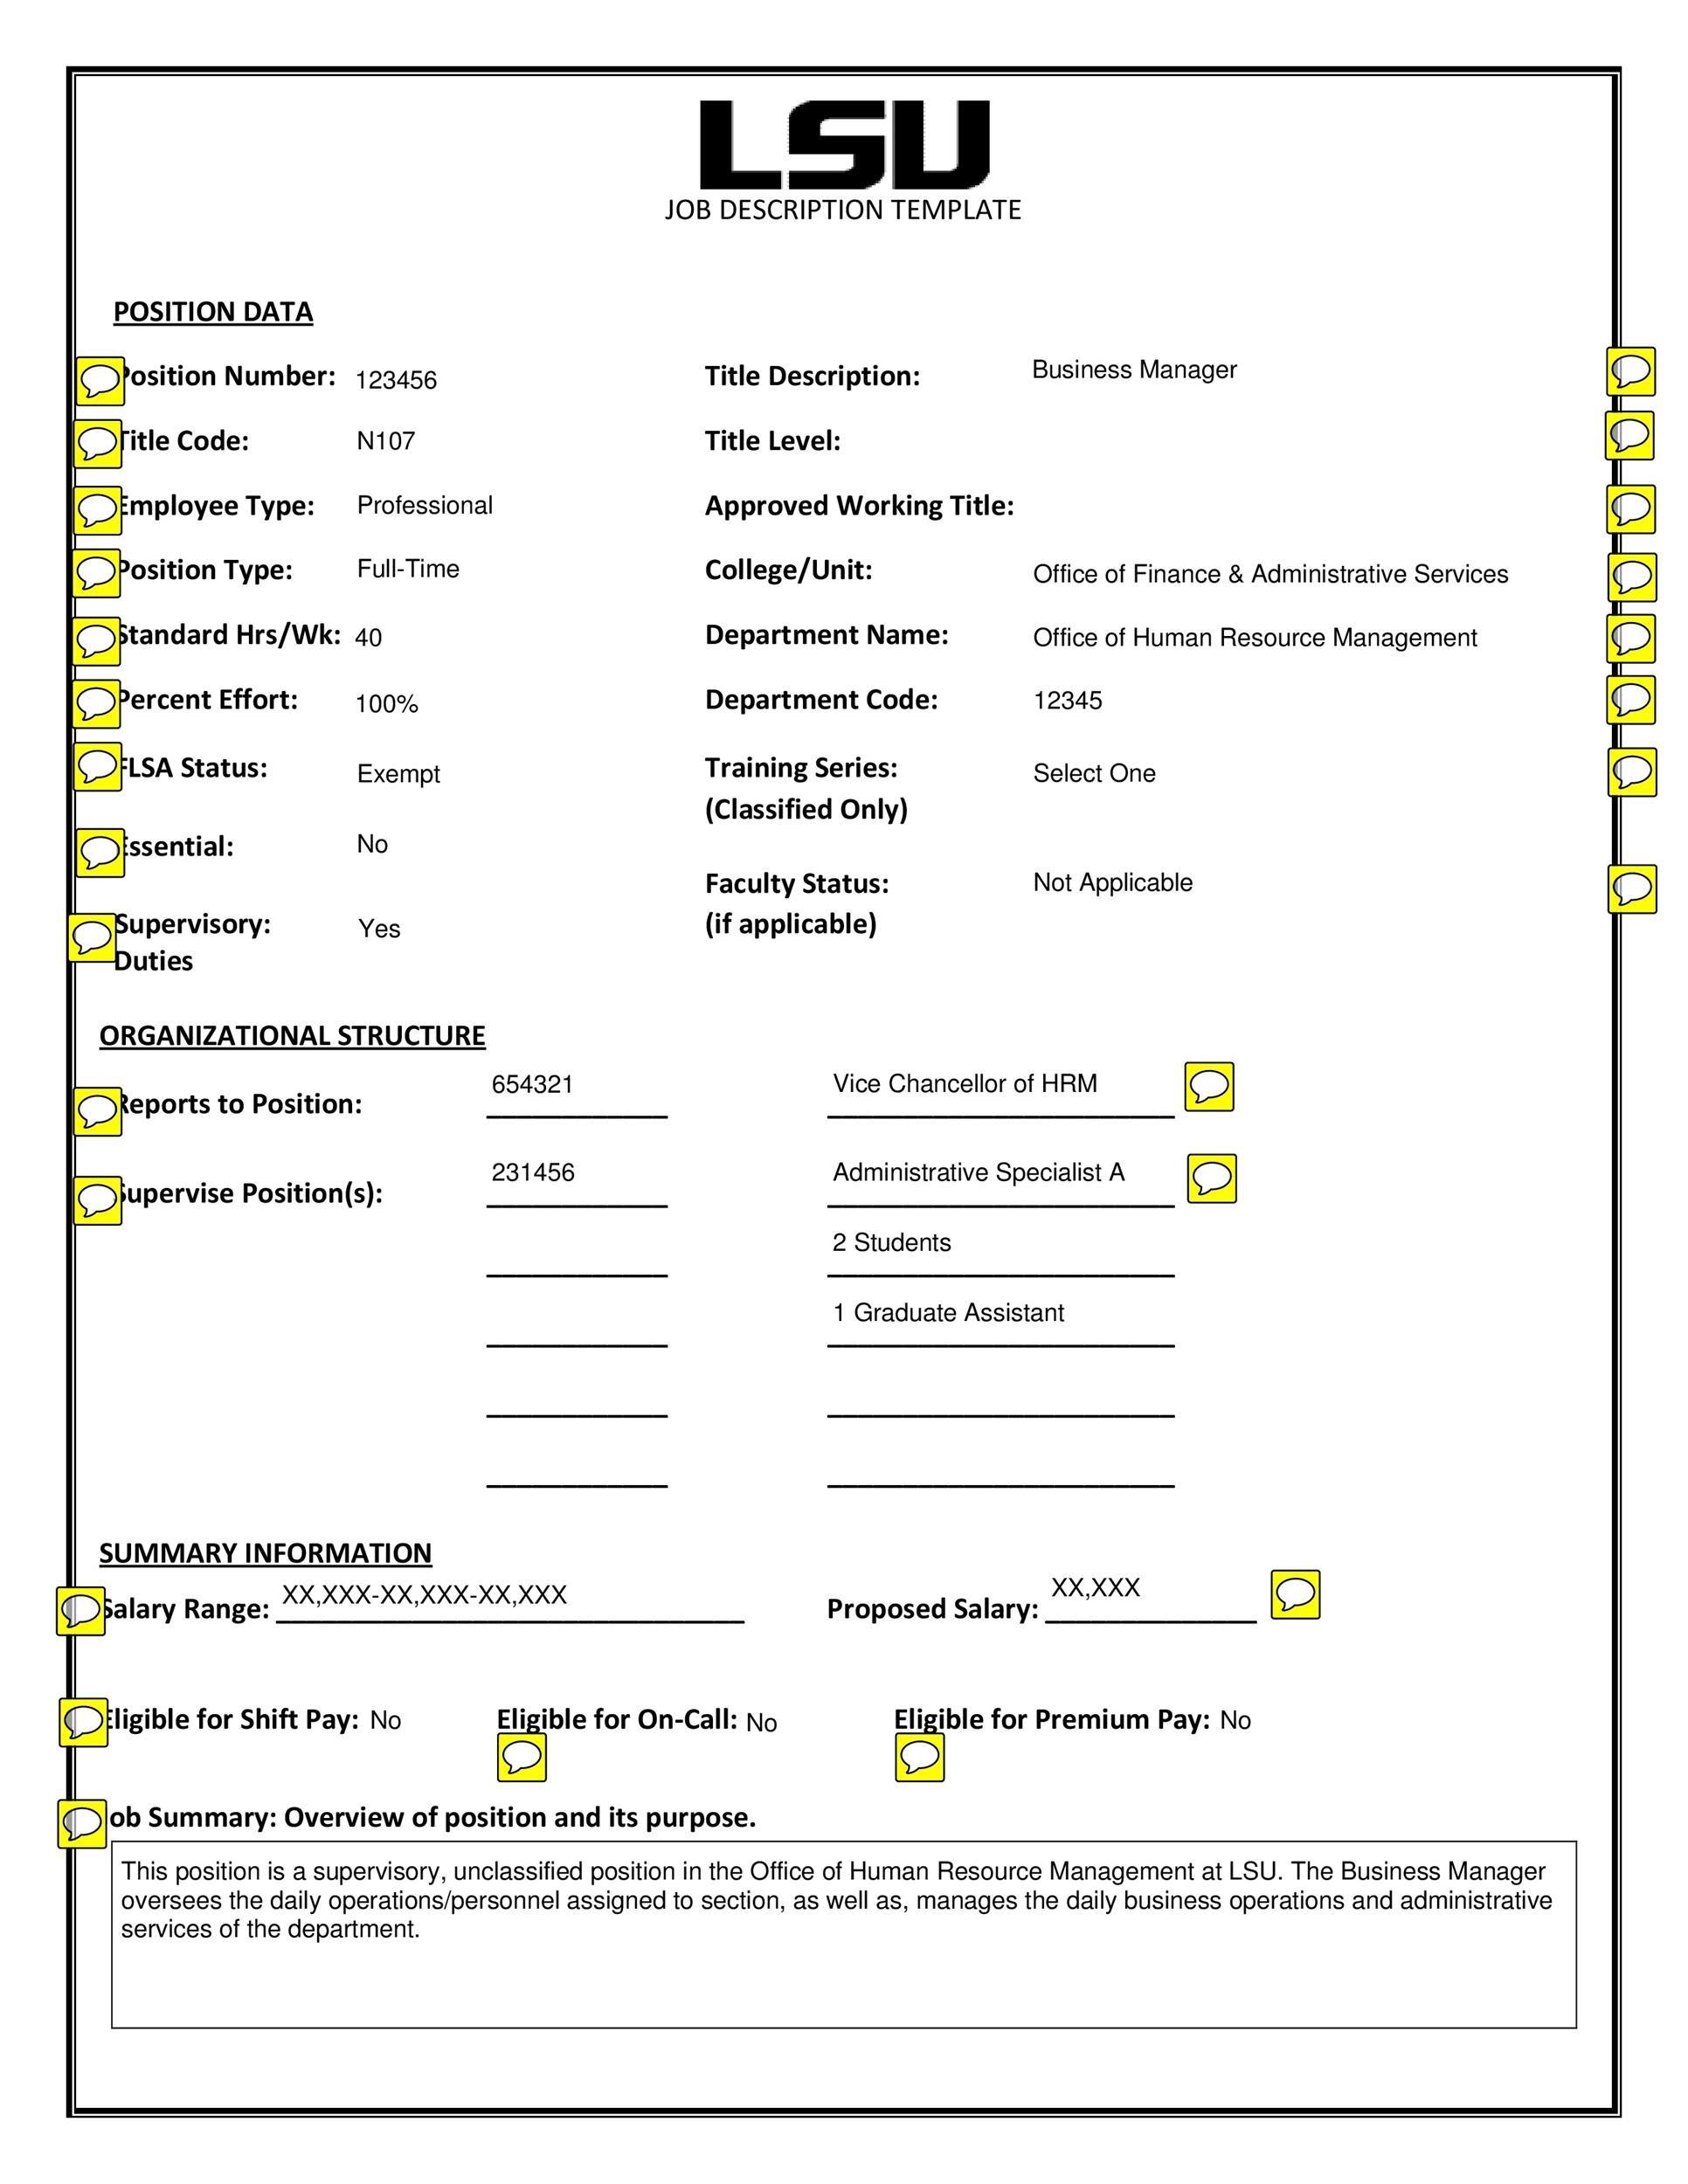 Free Job Description Template 14